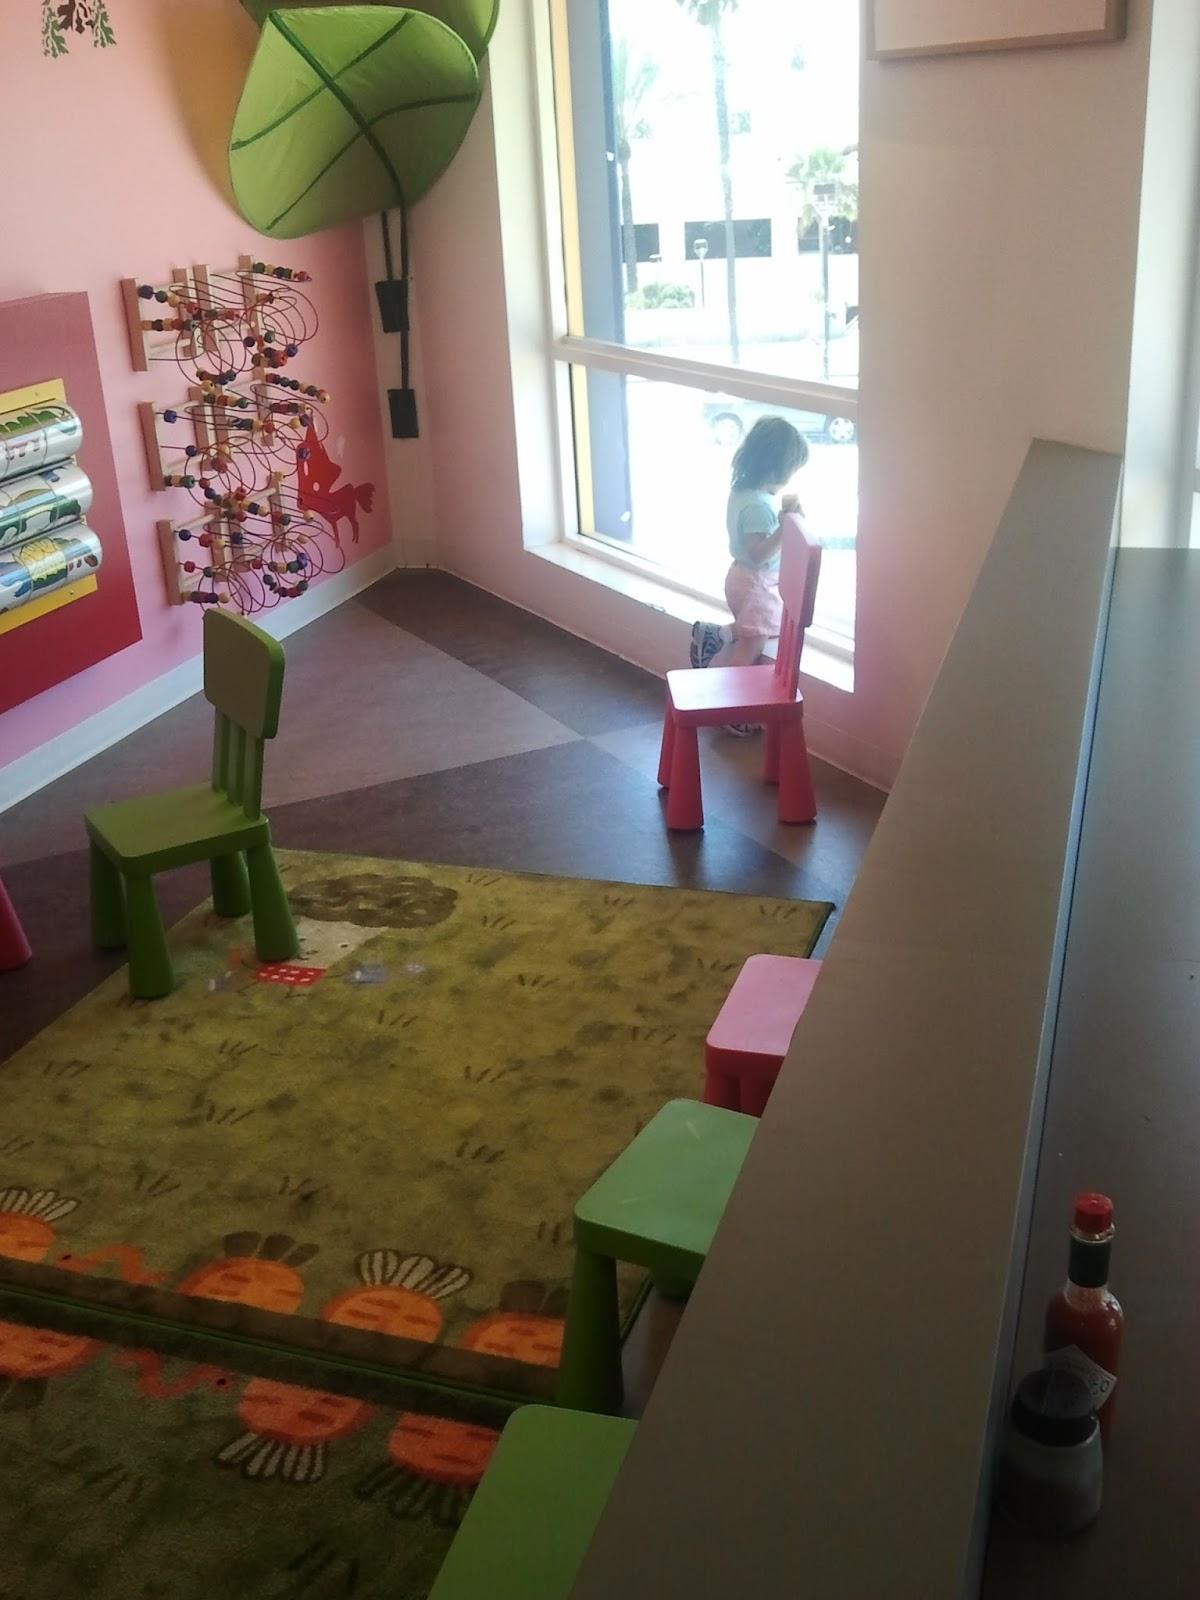 Going on a Kidscapade!: IKEA Burbank